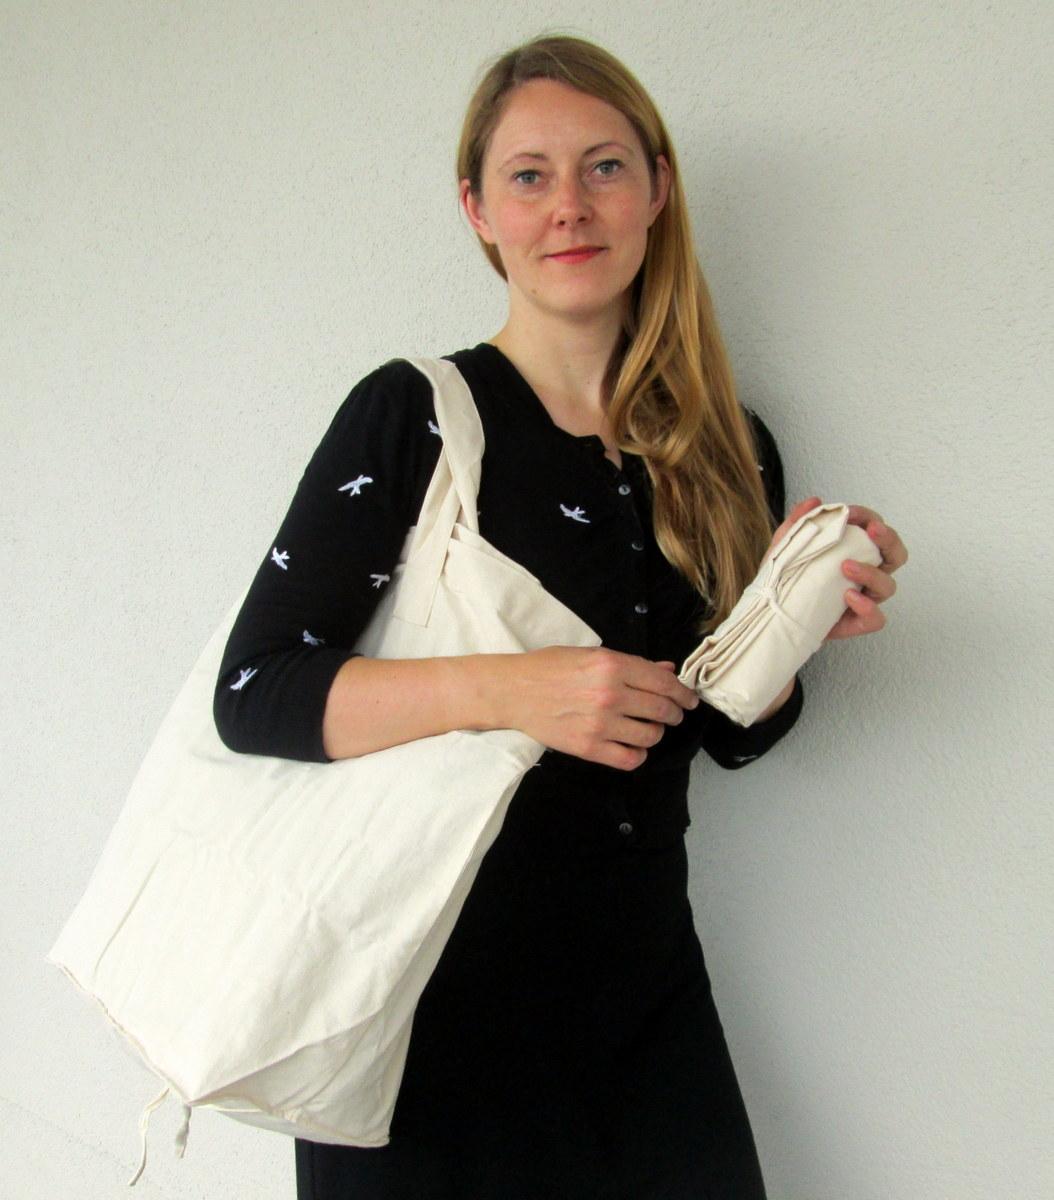 roll this shopping bag - Gundara